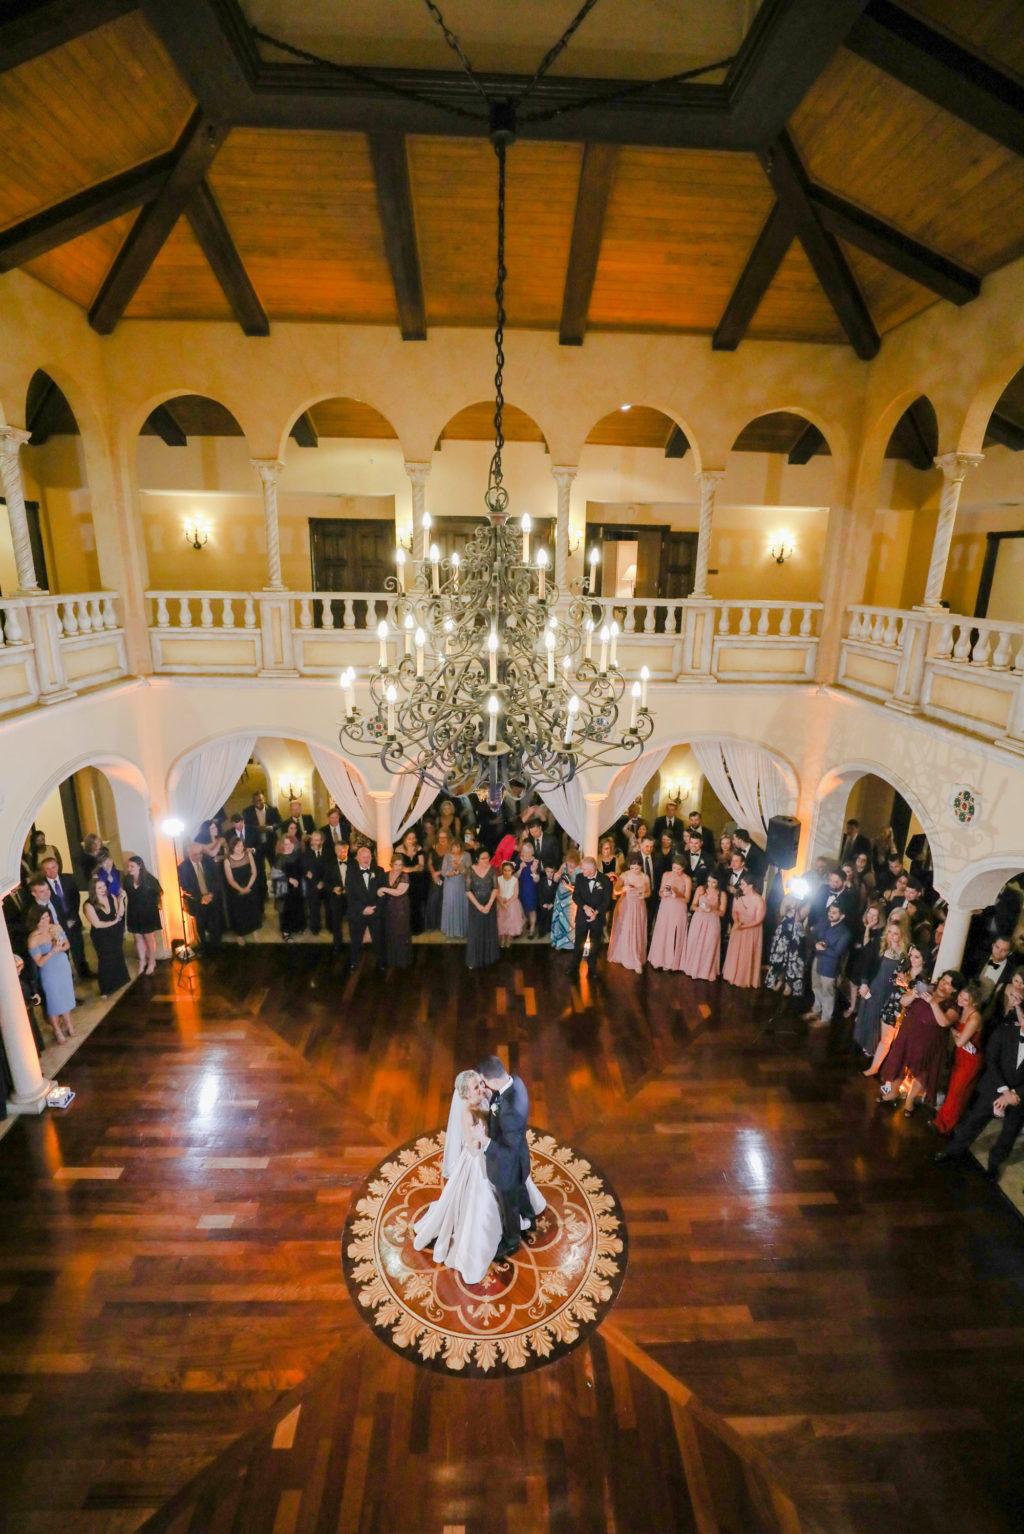 Tampa Wedding Venue Avila Golf & Country Club | Indoor Ballroom Reception with Dance Floor and Chandeliers | Tampa Bay Wedding Photographer Lifelong Photography Studio | DJ Grant Hemond & Associates